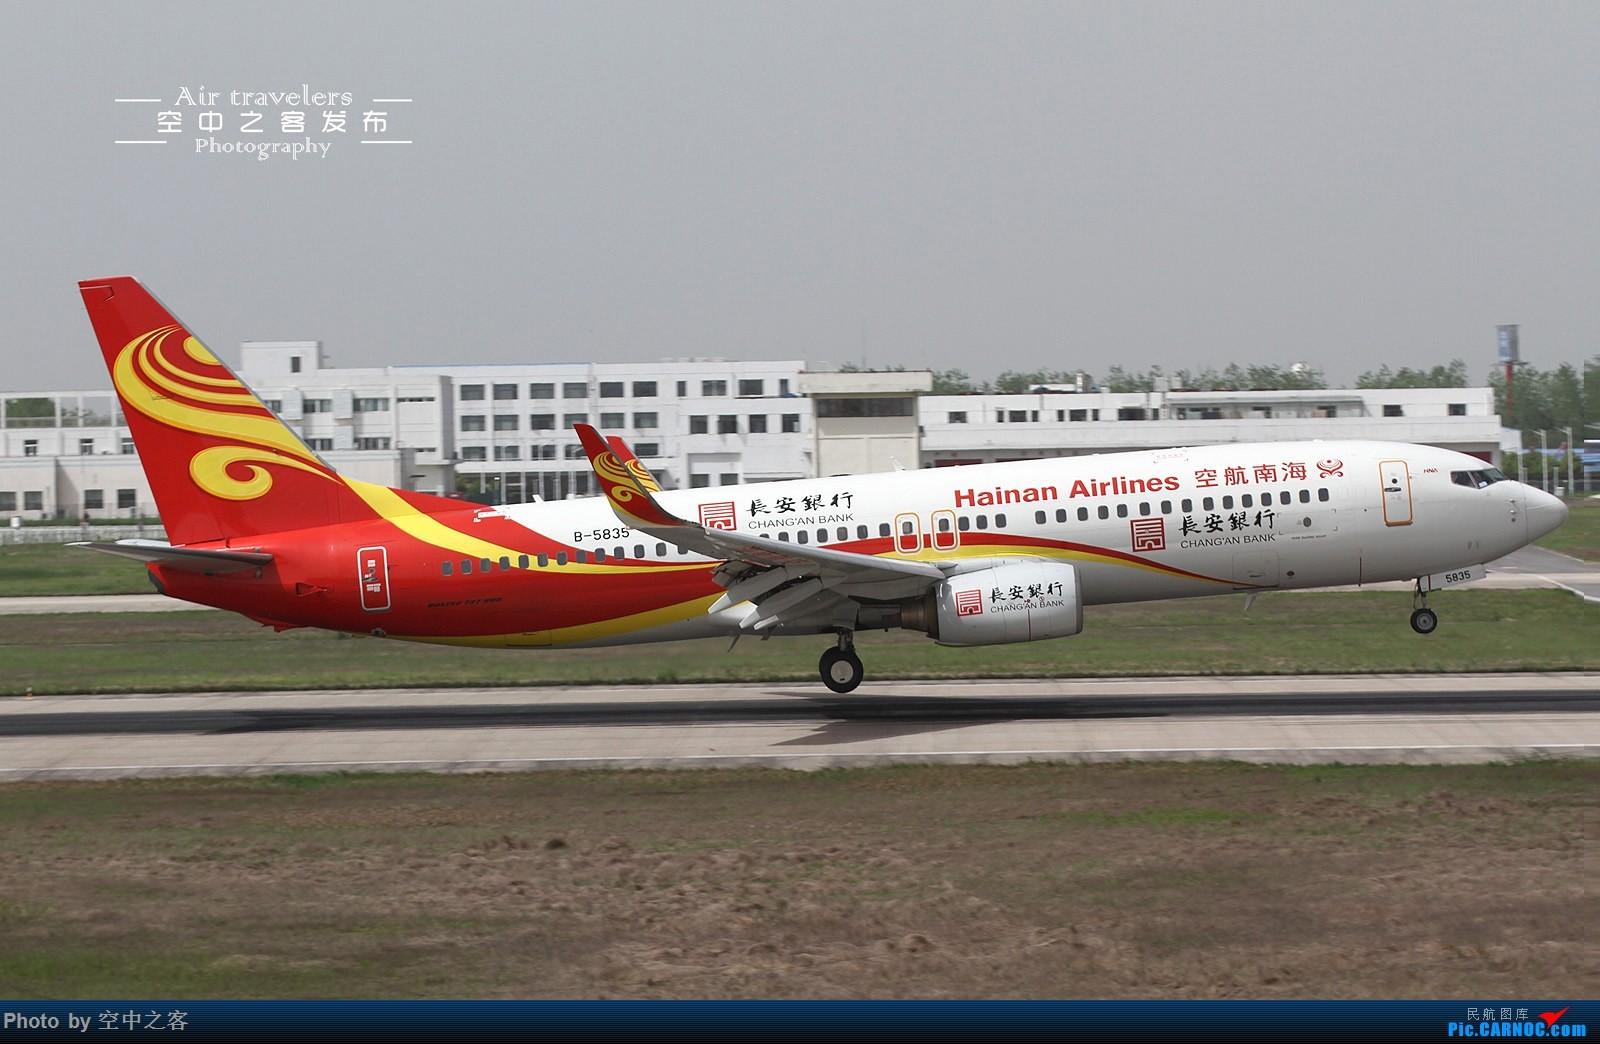 Re:][合肥飞友会·霸都打机队]空中之客发布 大佬们都不来的新机场 龙江321 海航 首航广告机来袭 AIRBUS A330-300 B-8358 合肥新桥国际机场